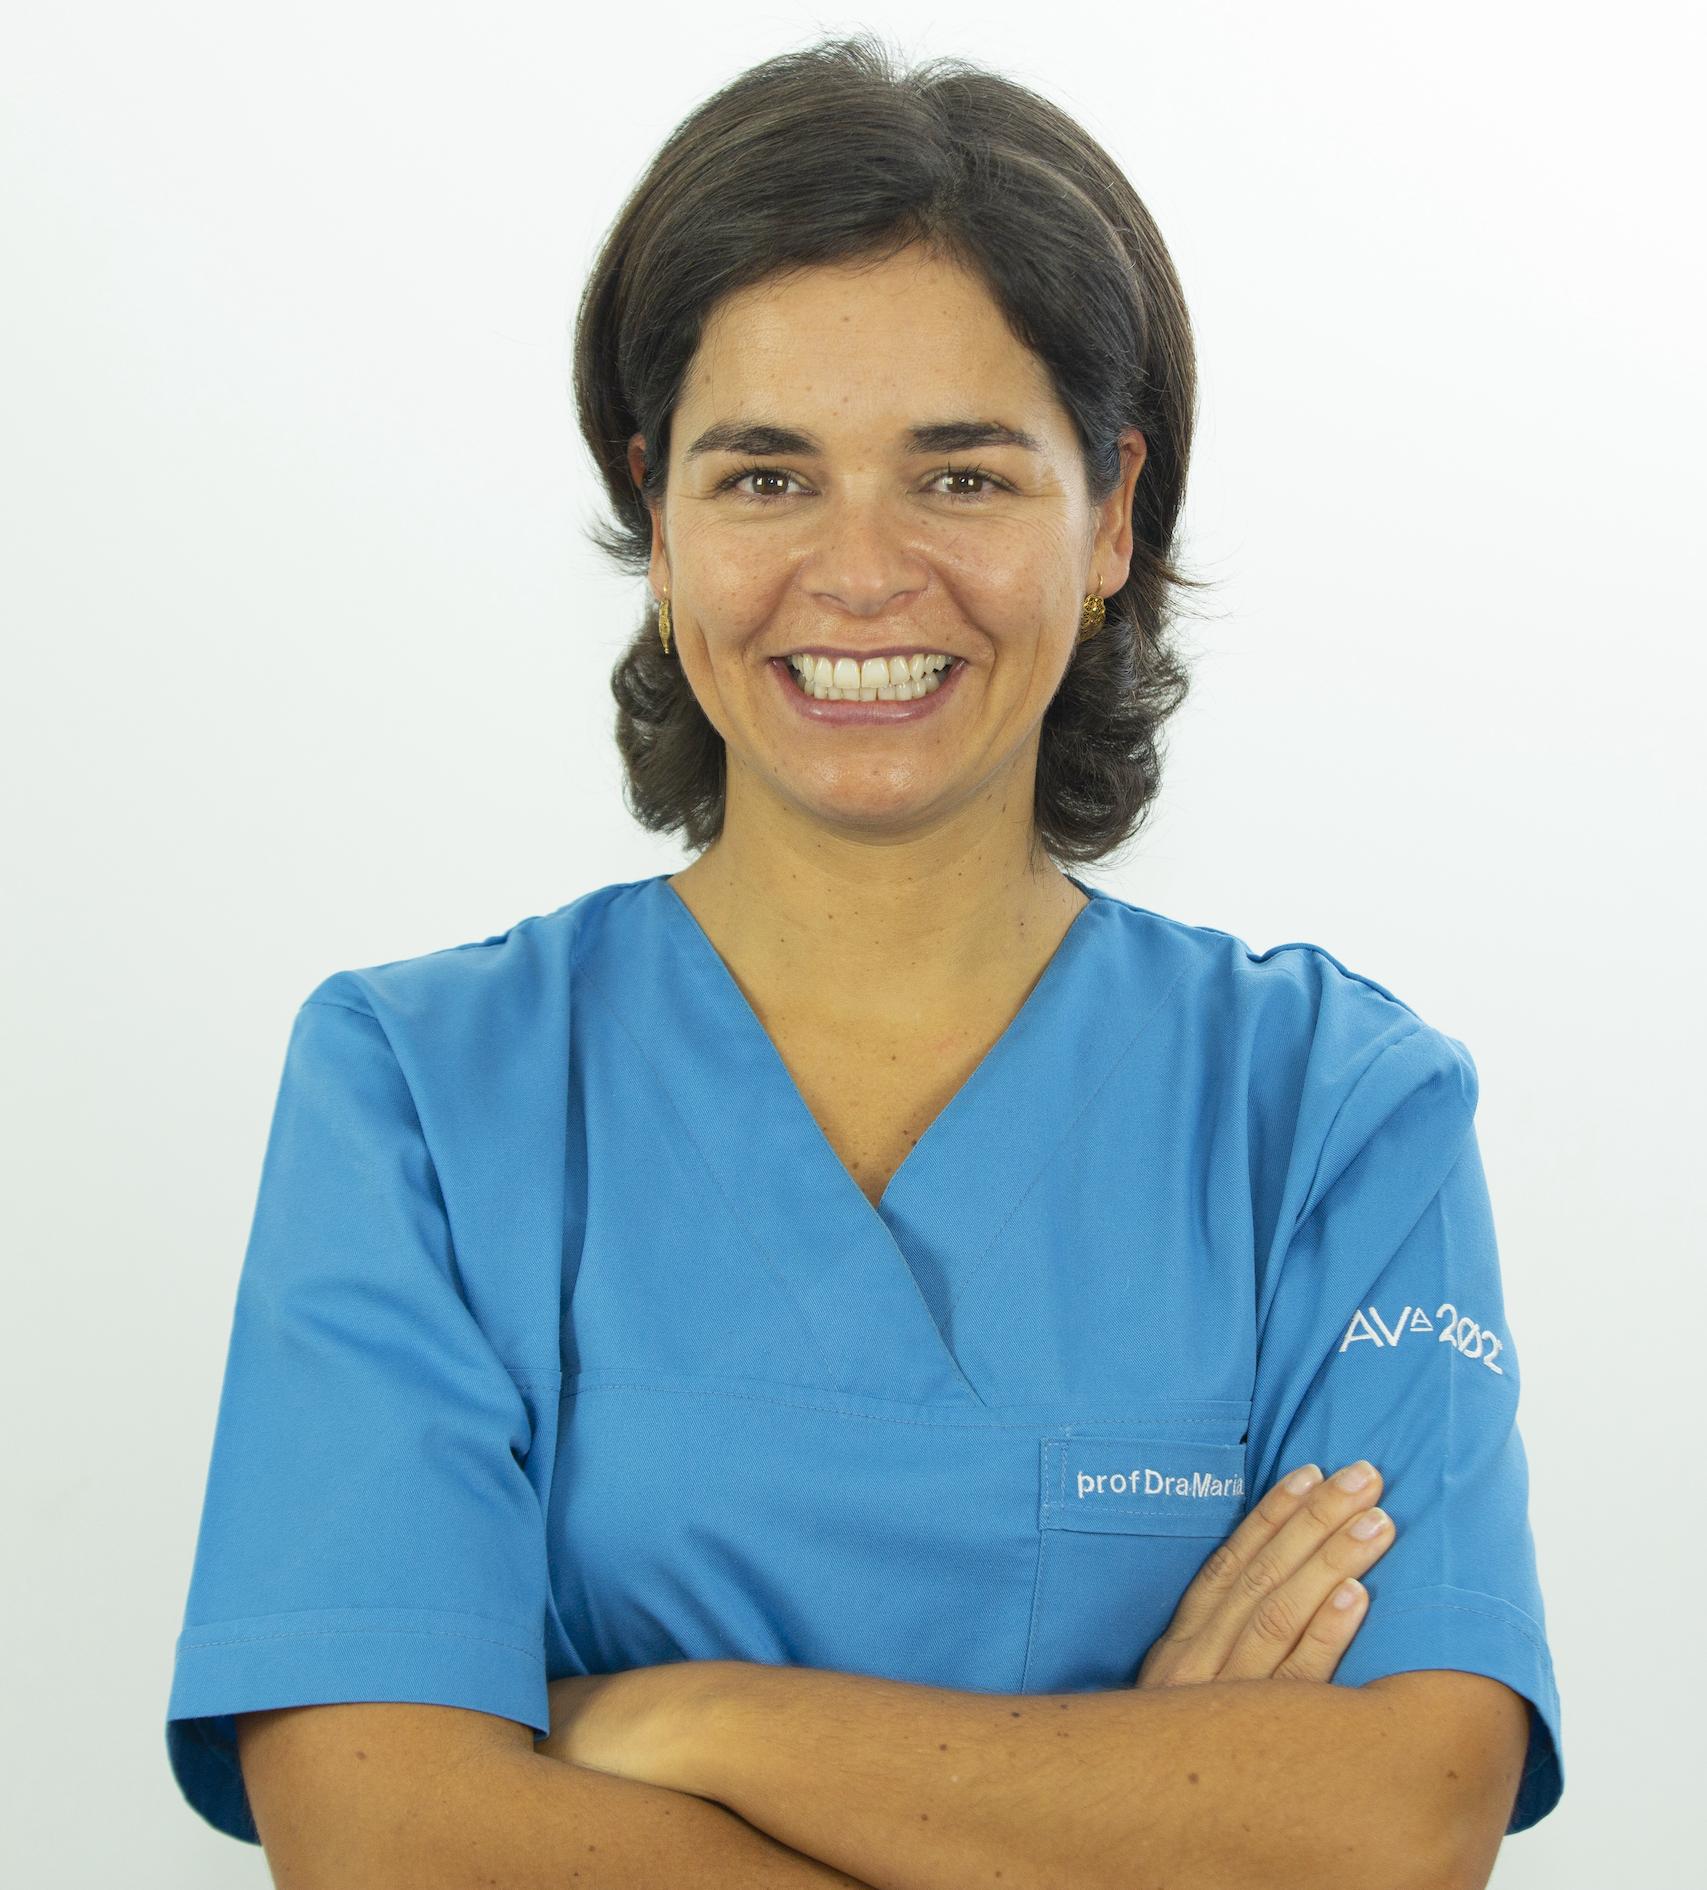 MARIA CARLOS QUARESMA